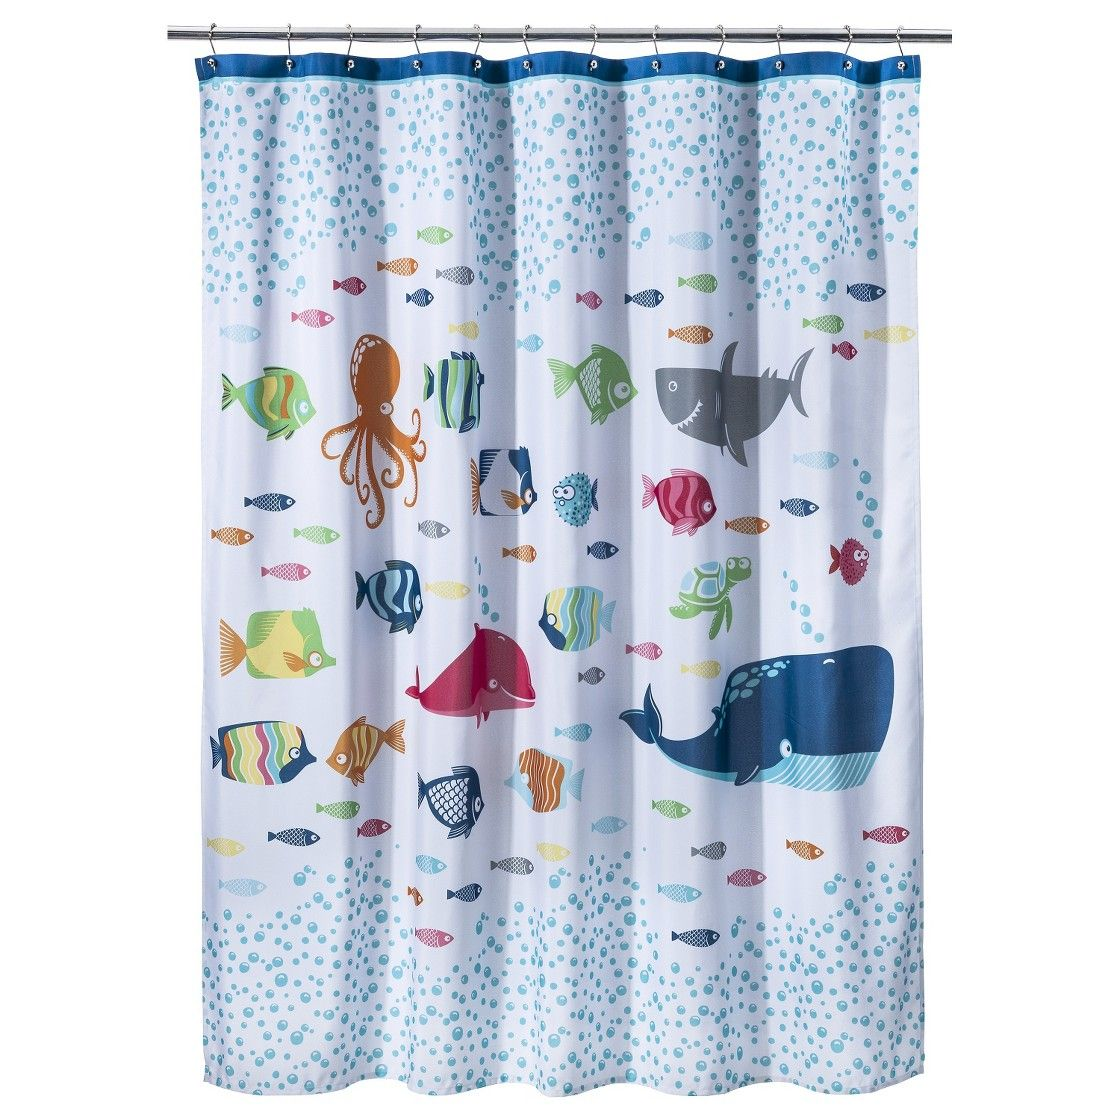 Circo Fish Shower Curtain Kids Shower Curtain Shower Curtain Bathroom Sets